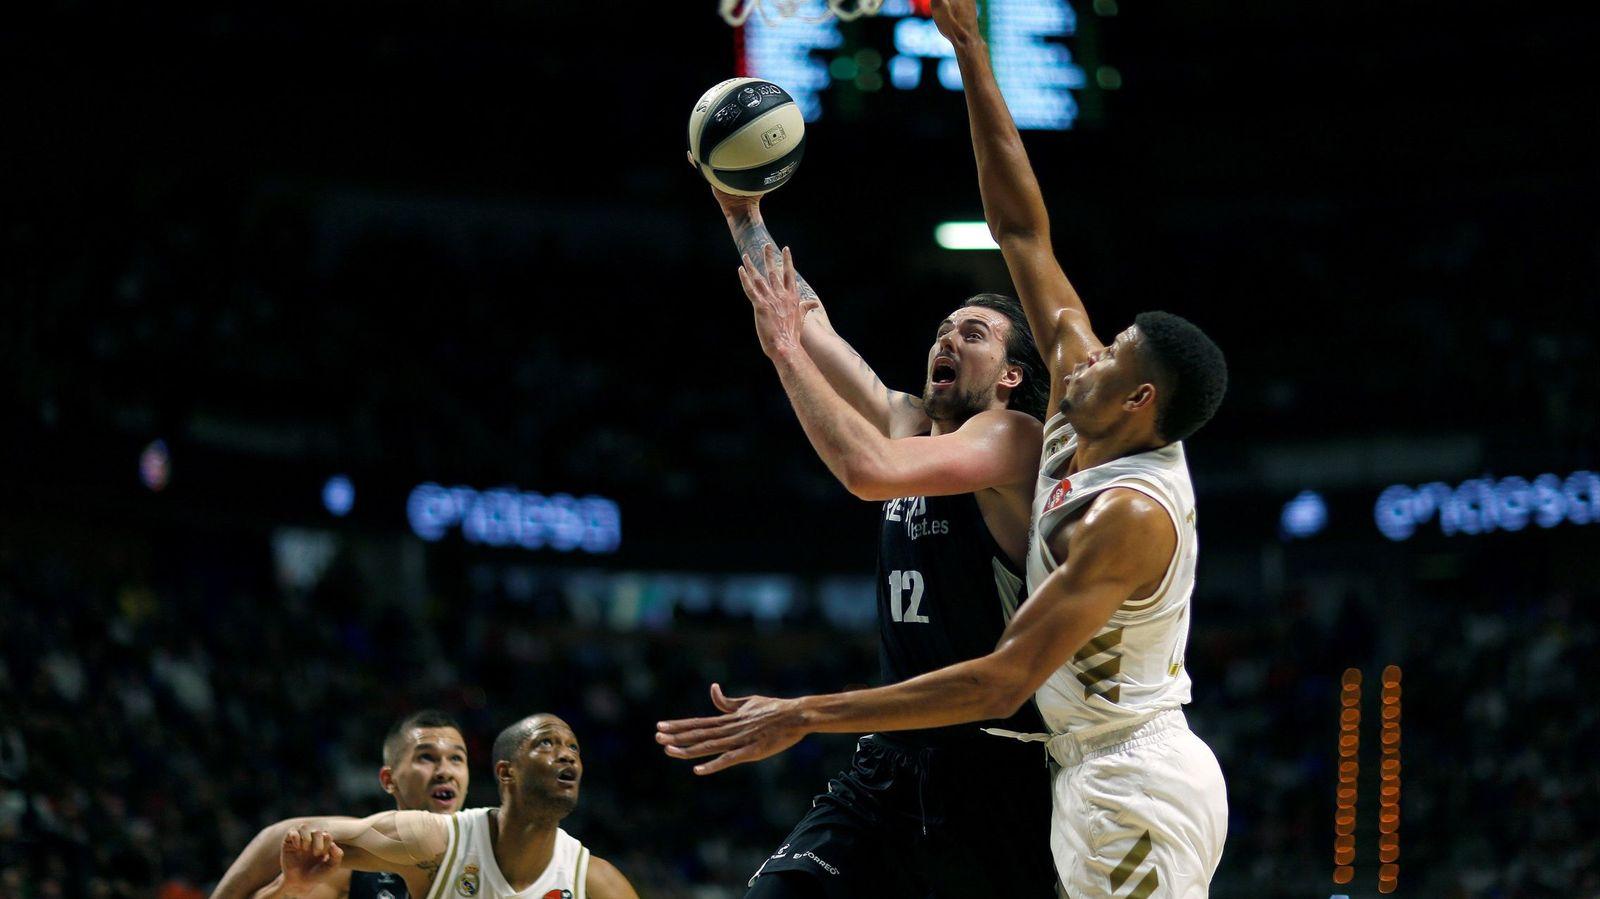 Foto: Real madrid - bilbao basket